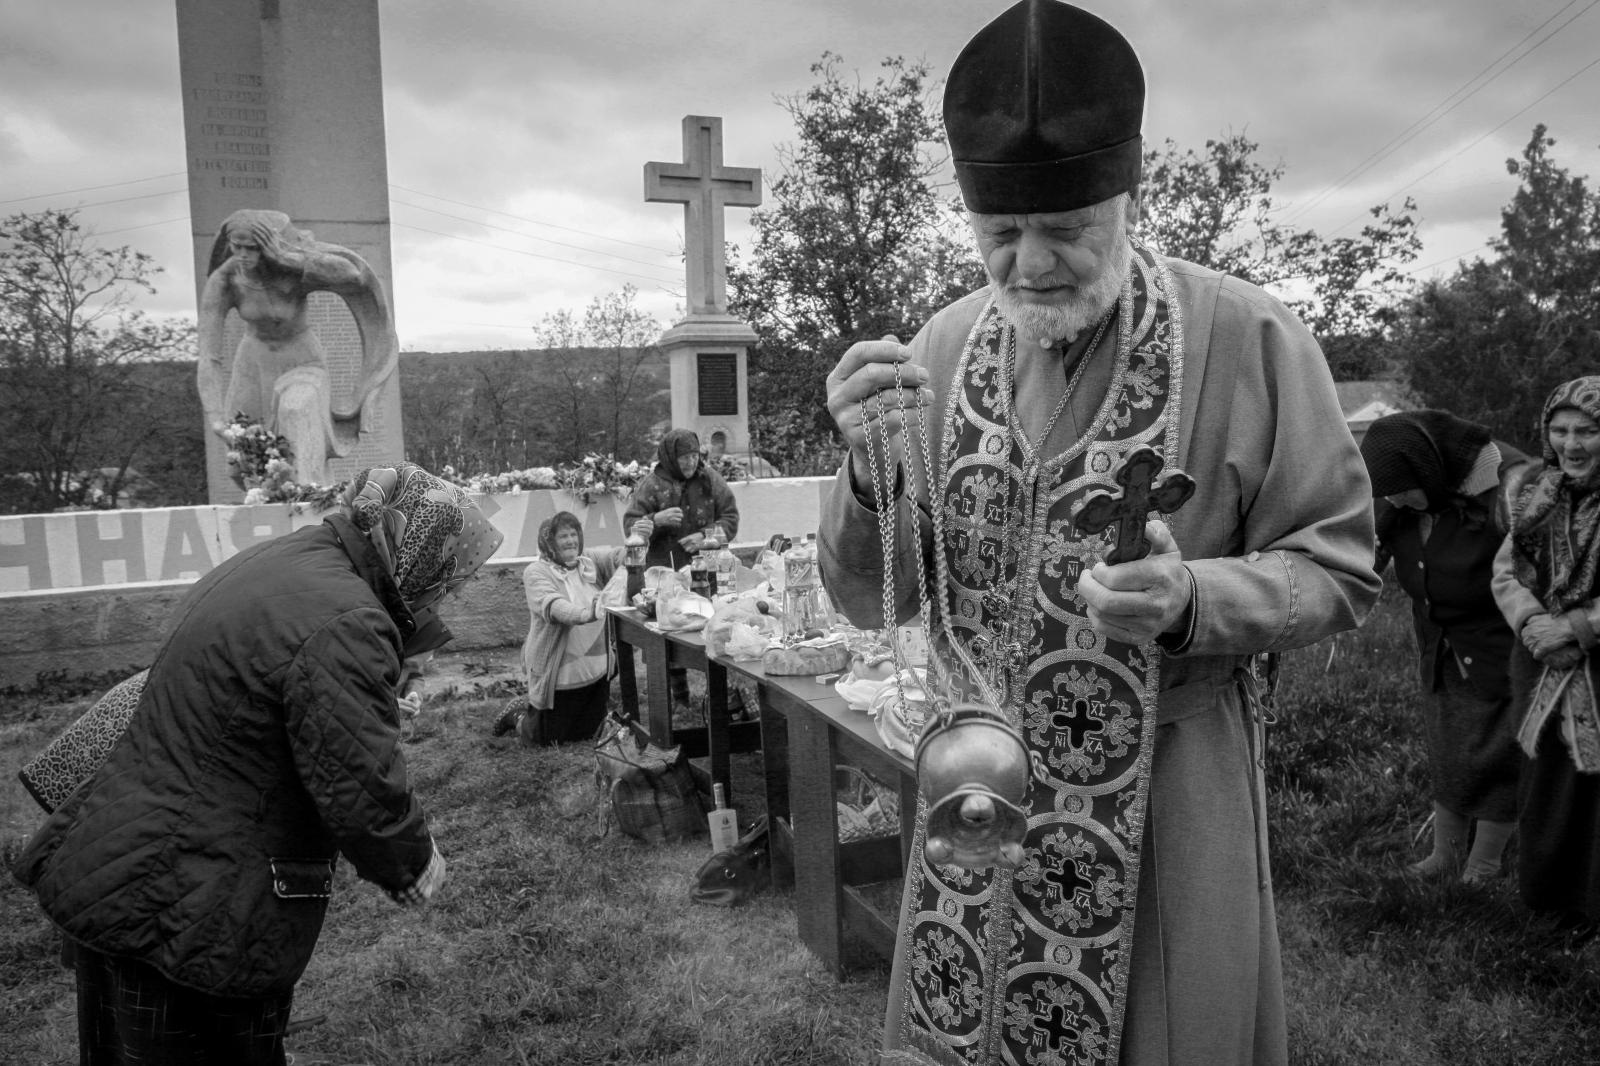 Art and Documentary Photography - Loading bwMary-Estes_Moldova_05-09-2017_0027.JPG